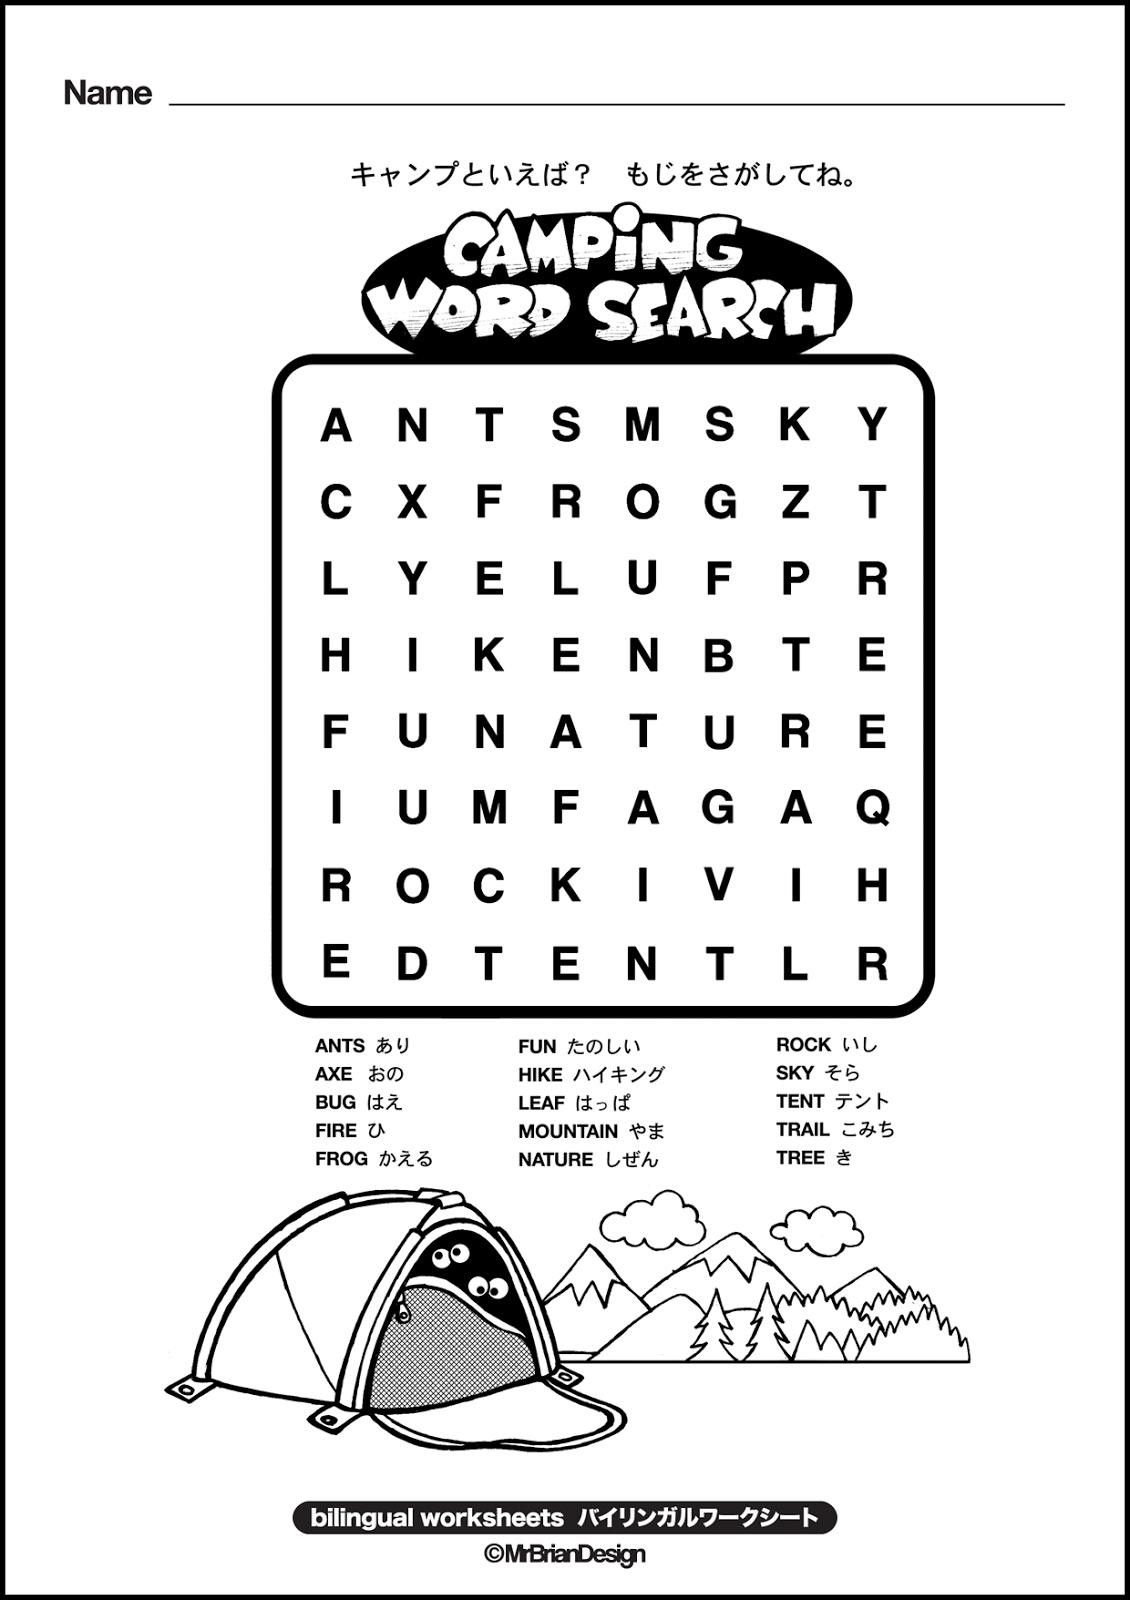 Printable Crossword Puzzles | Travel And Adventure | Printable | Bilingual Worksheets Printable